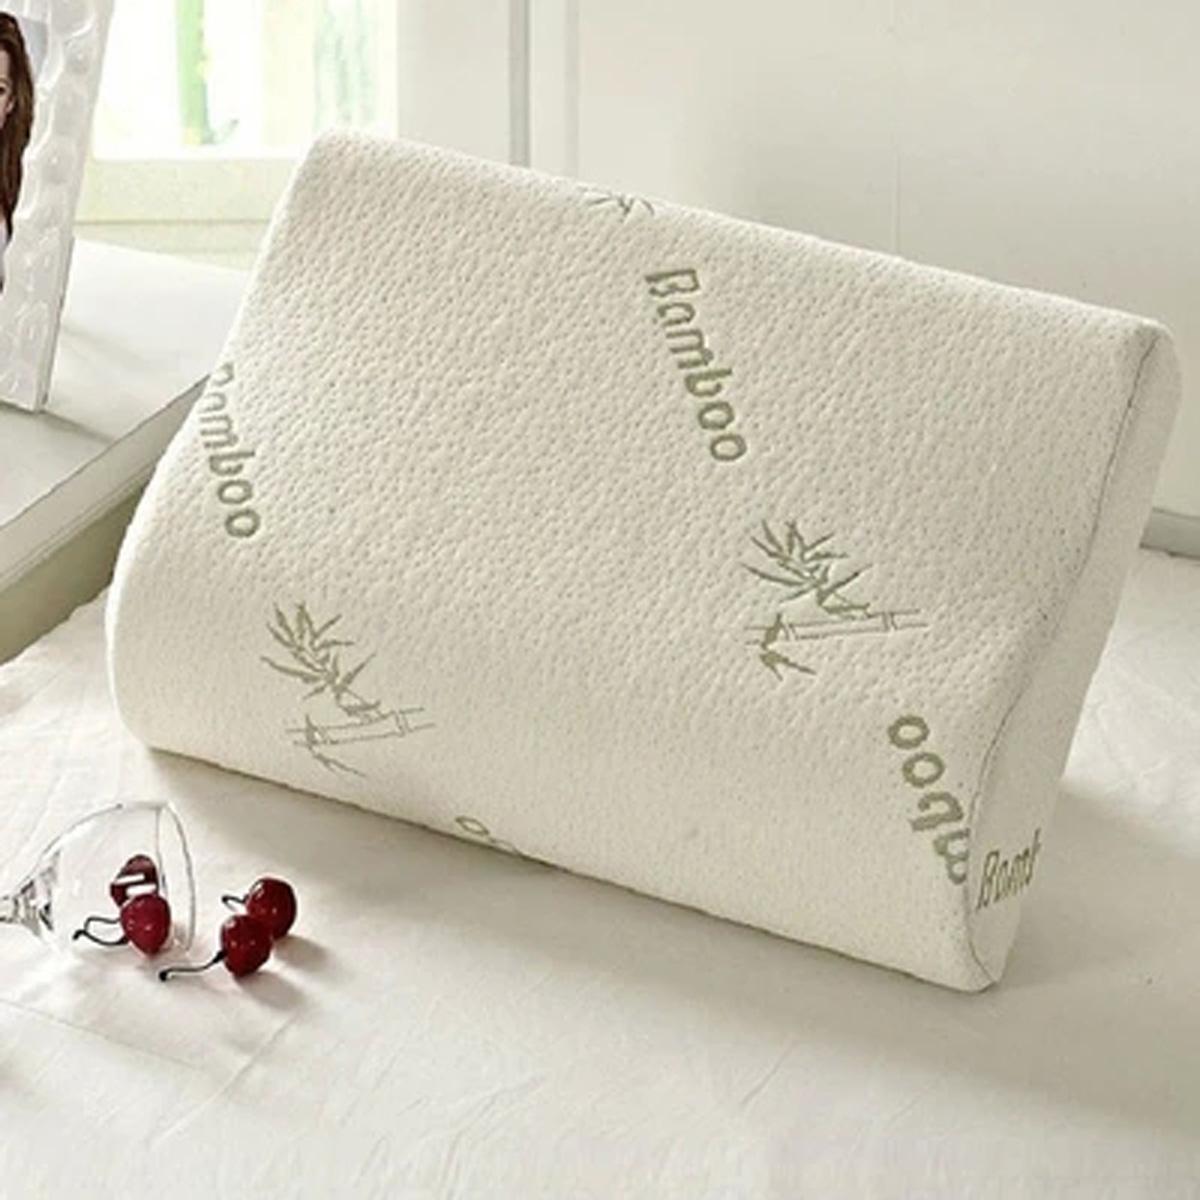 30x50 Sleep Bamboo Fiber Slow Rebound Memory Foam Pillow